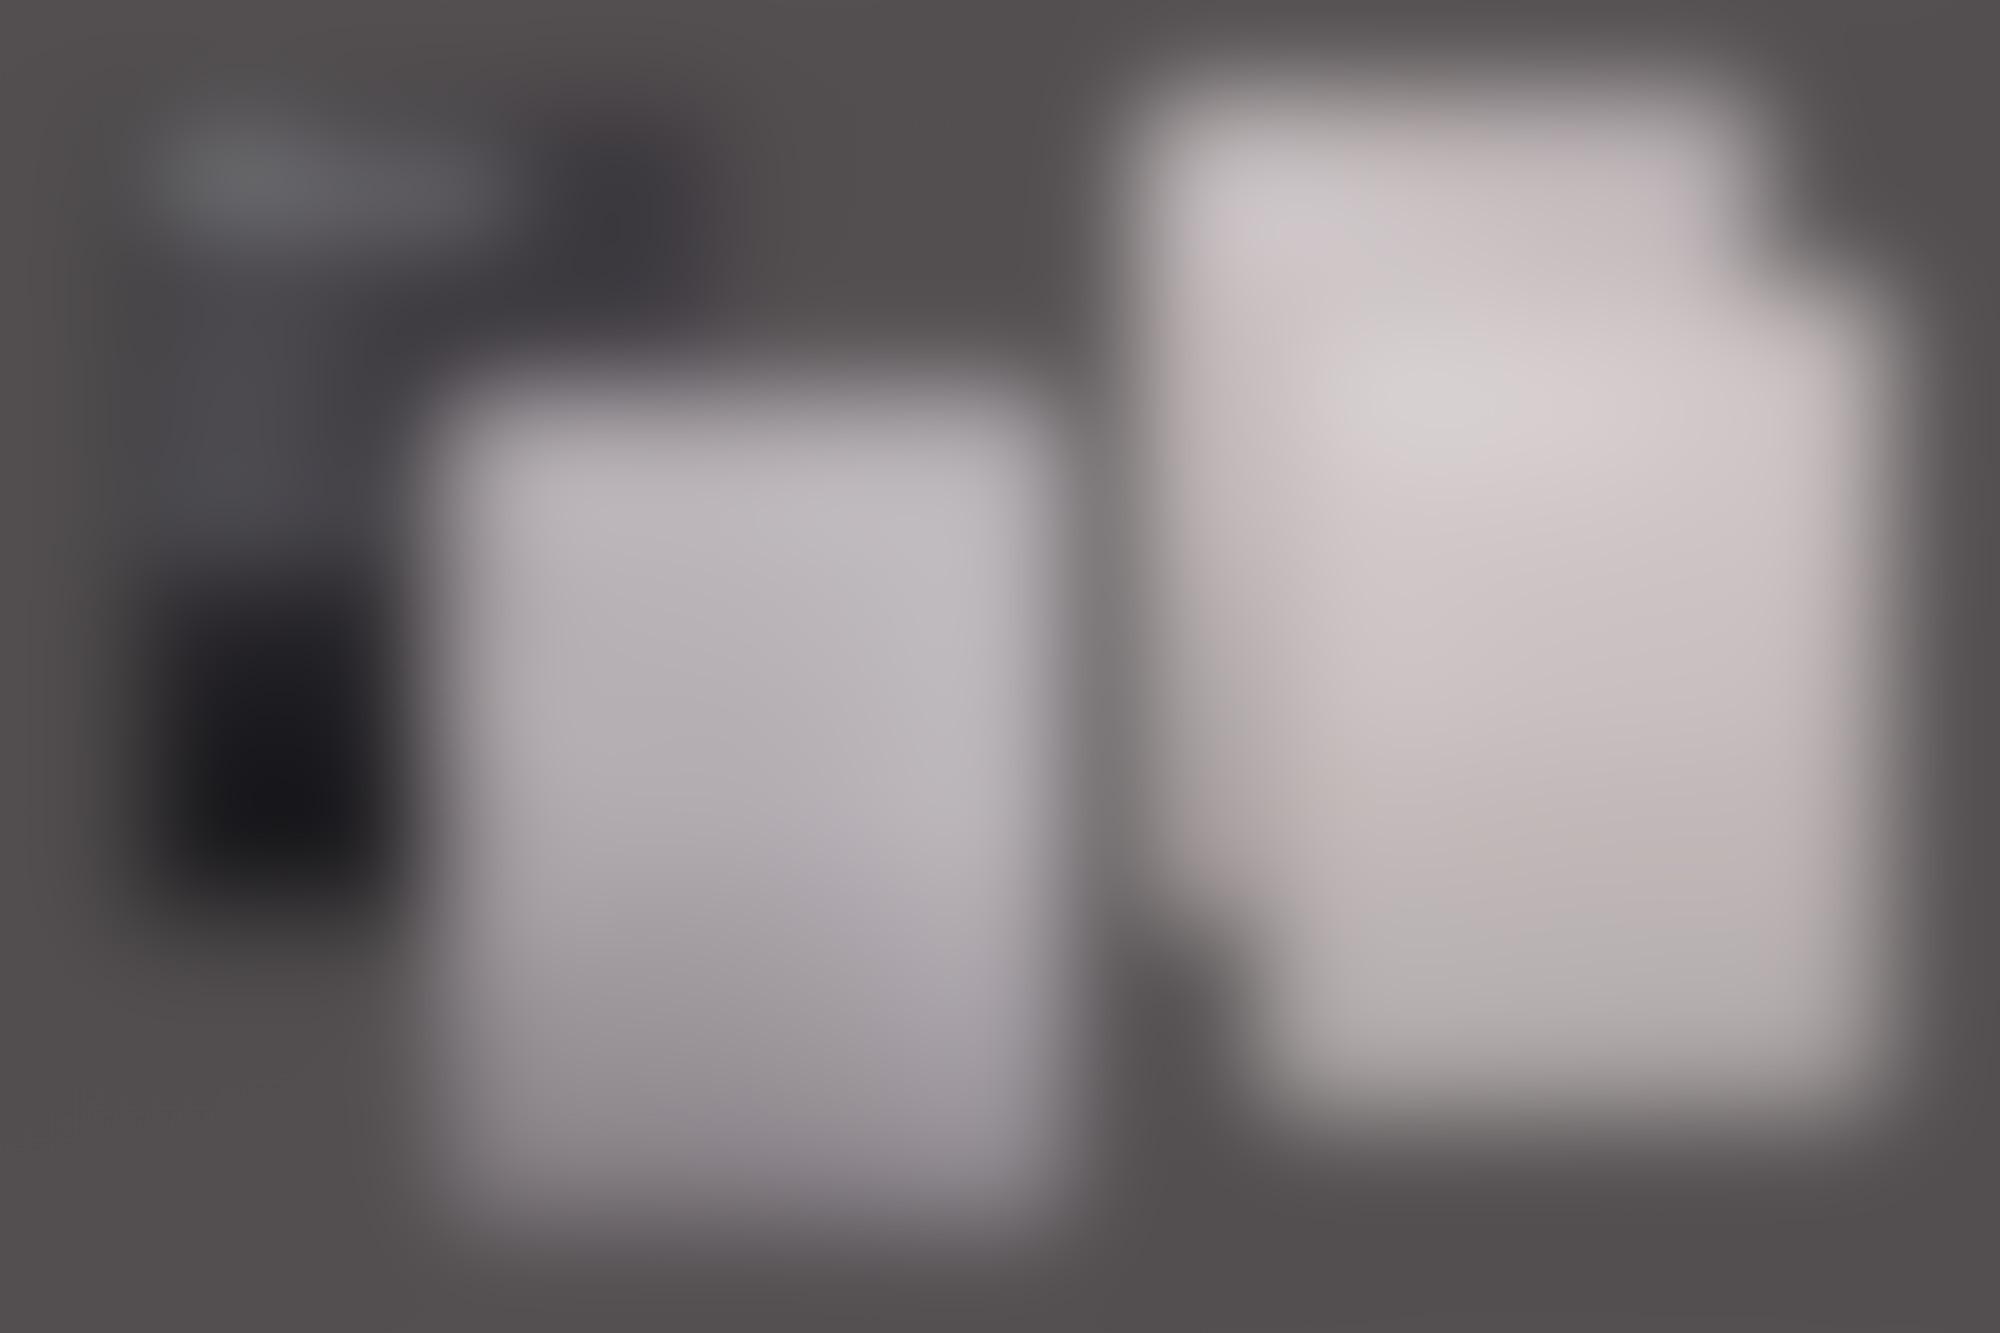 Tvc print 01 autocompressfitresizeixlibphp 1 1 0max h2000max w3 D2000q80s65542e8a7d6fd49bd91cef65607dffd5